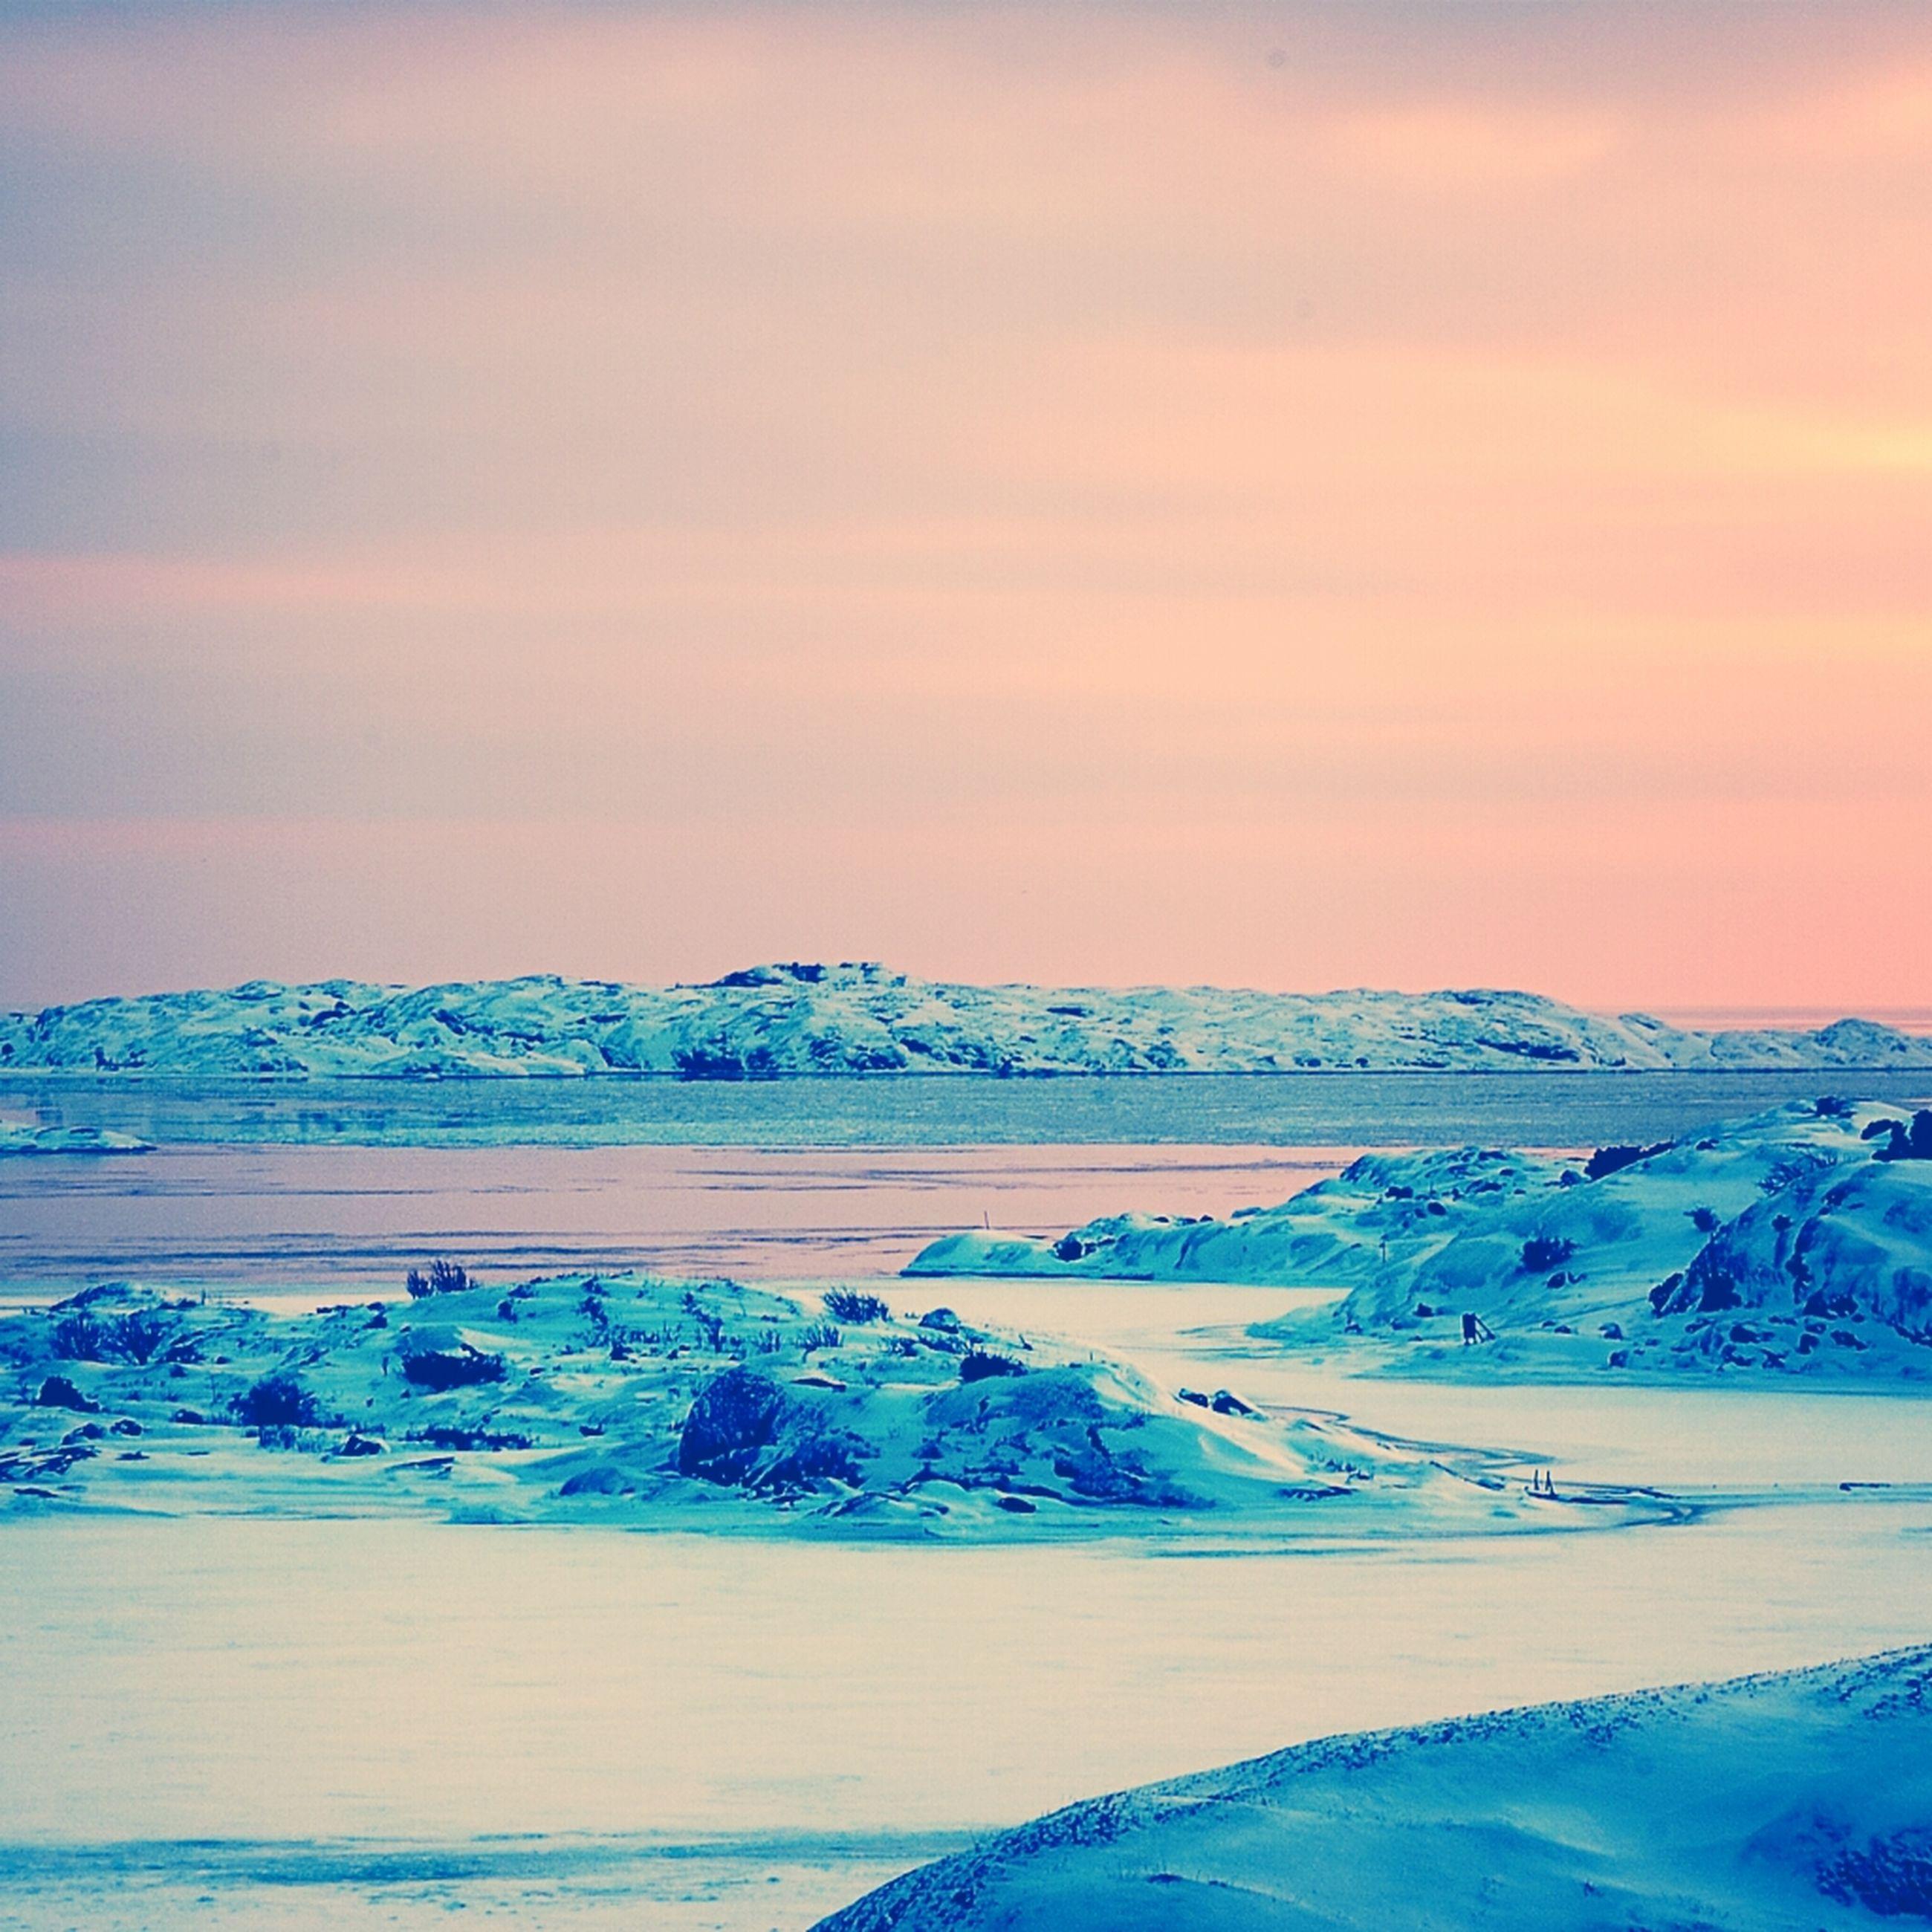 snow, cold temperature, winter, season, weather, beauty in nature, scenics, frozen, tranquil scene, tranquility, covering, sunset, sky, nature, idyllic, landscape, cloud - sky, blue, orange color, non-urban scene